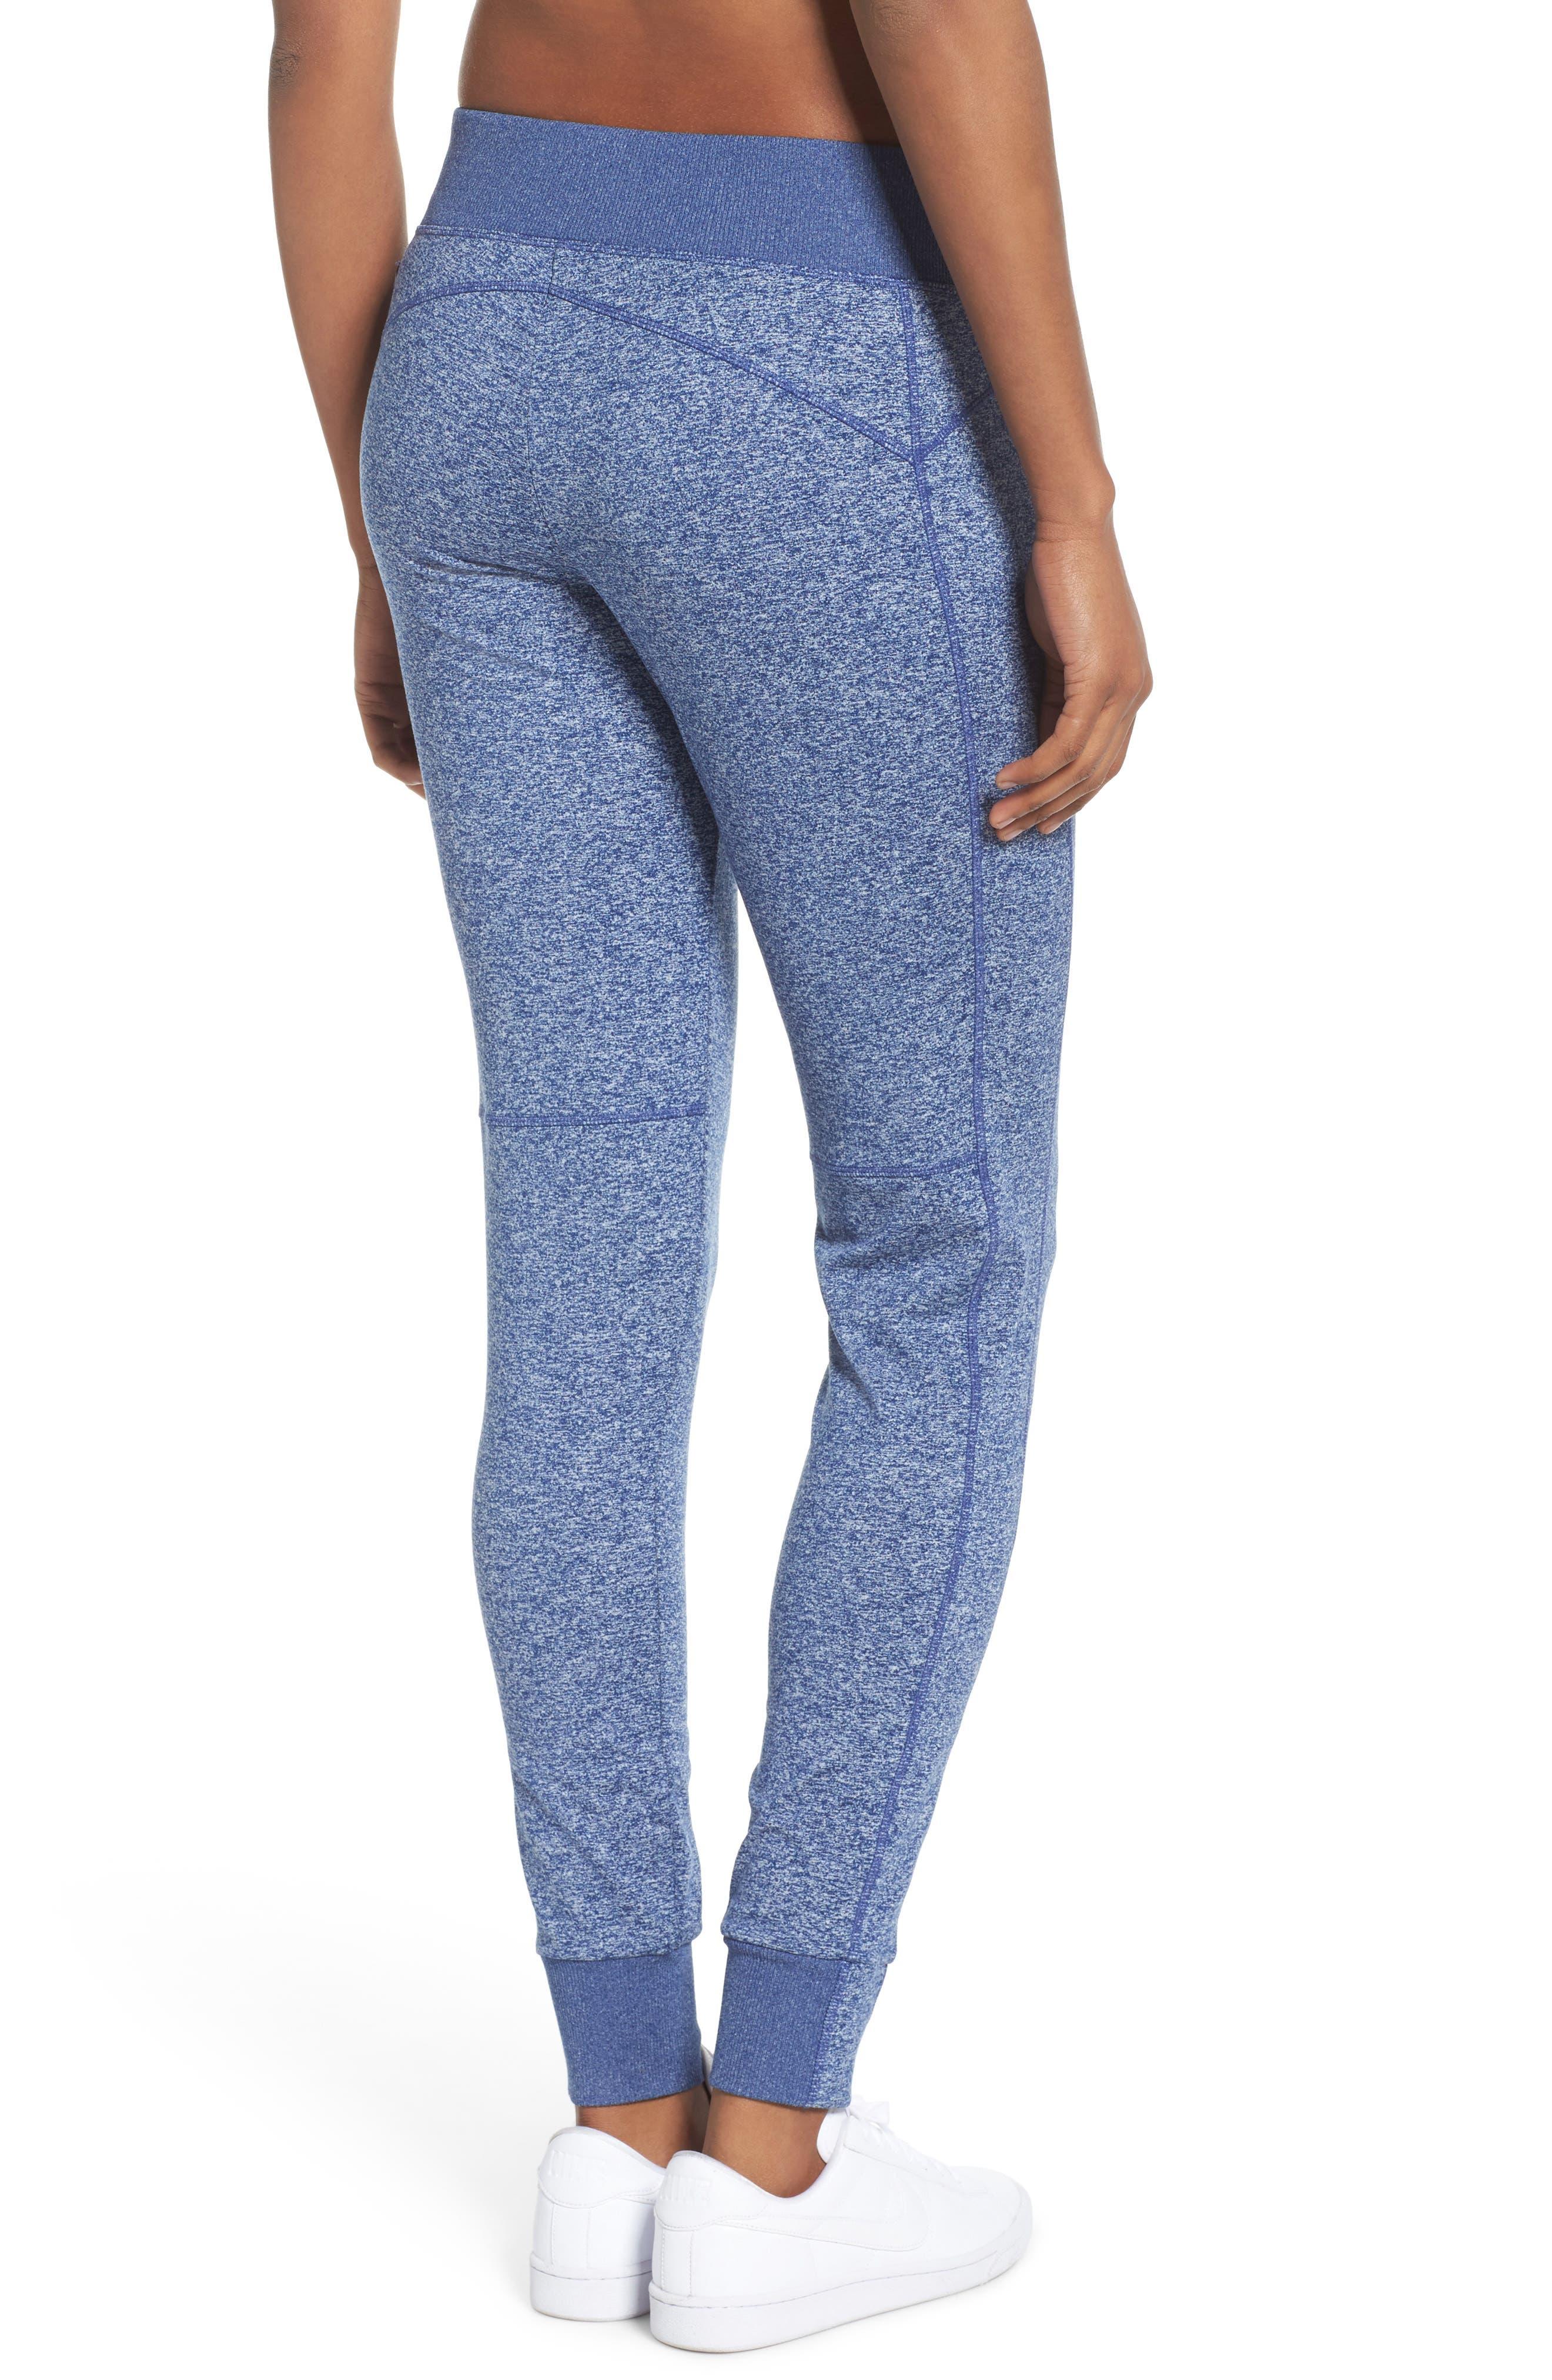 Taryn Sport Knit Pants,                             Alternate thumbnail 2, color,                             Blue Depths Melange